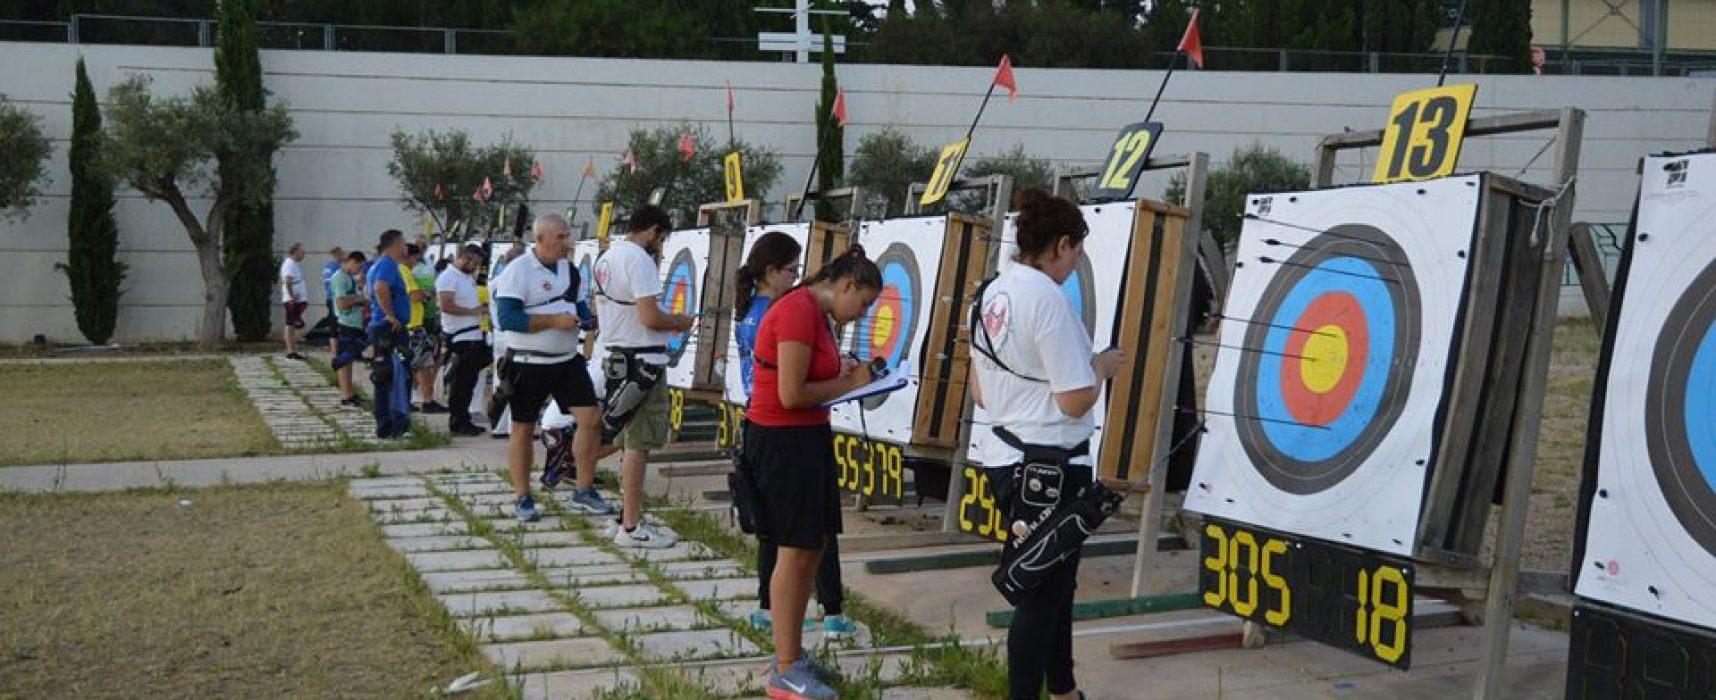 H προκήρυξη του αγώνα Ανοιχτού Χώρου στο OΑΚΑ το Σαββατοκύριακο 19 & 20 Σεπτεμβρίου